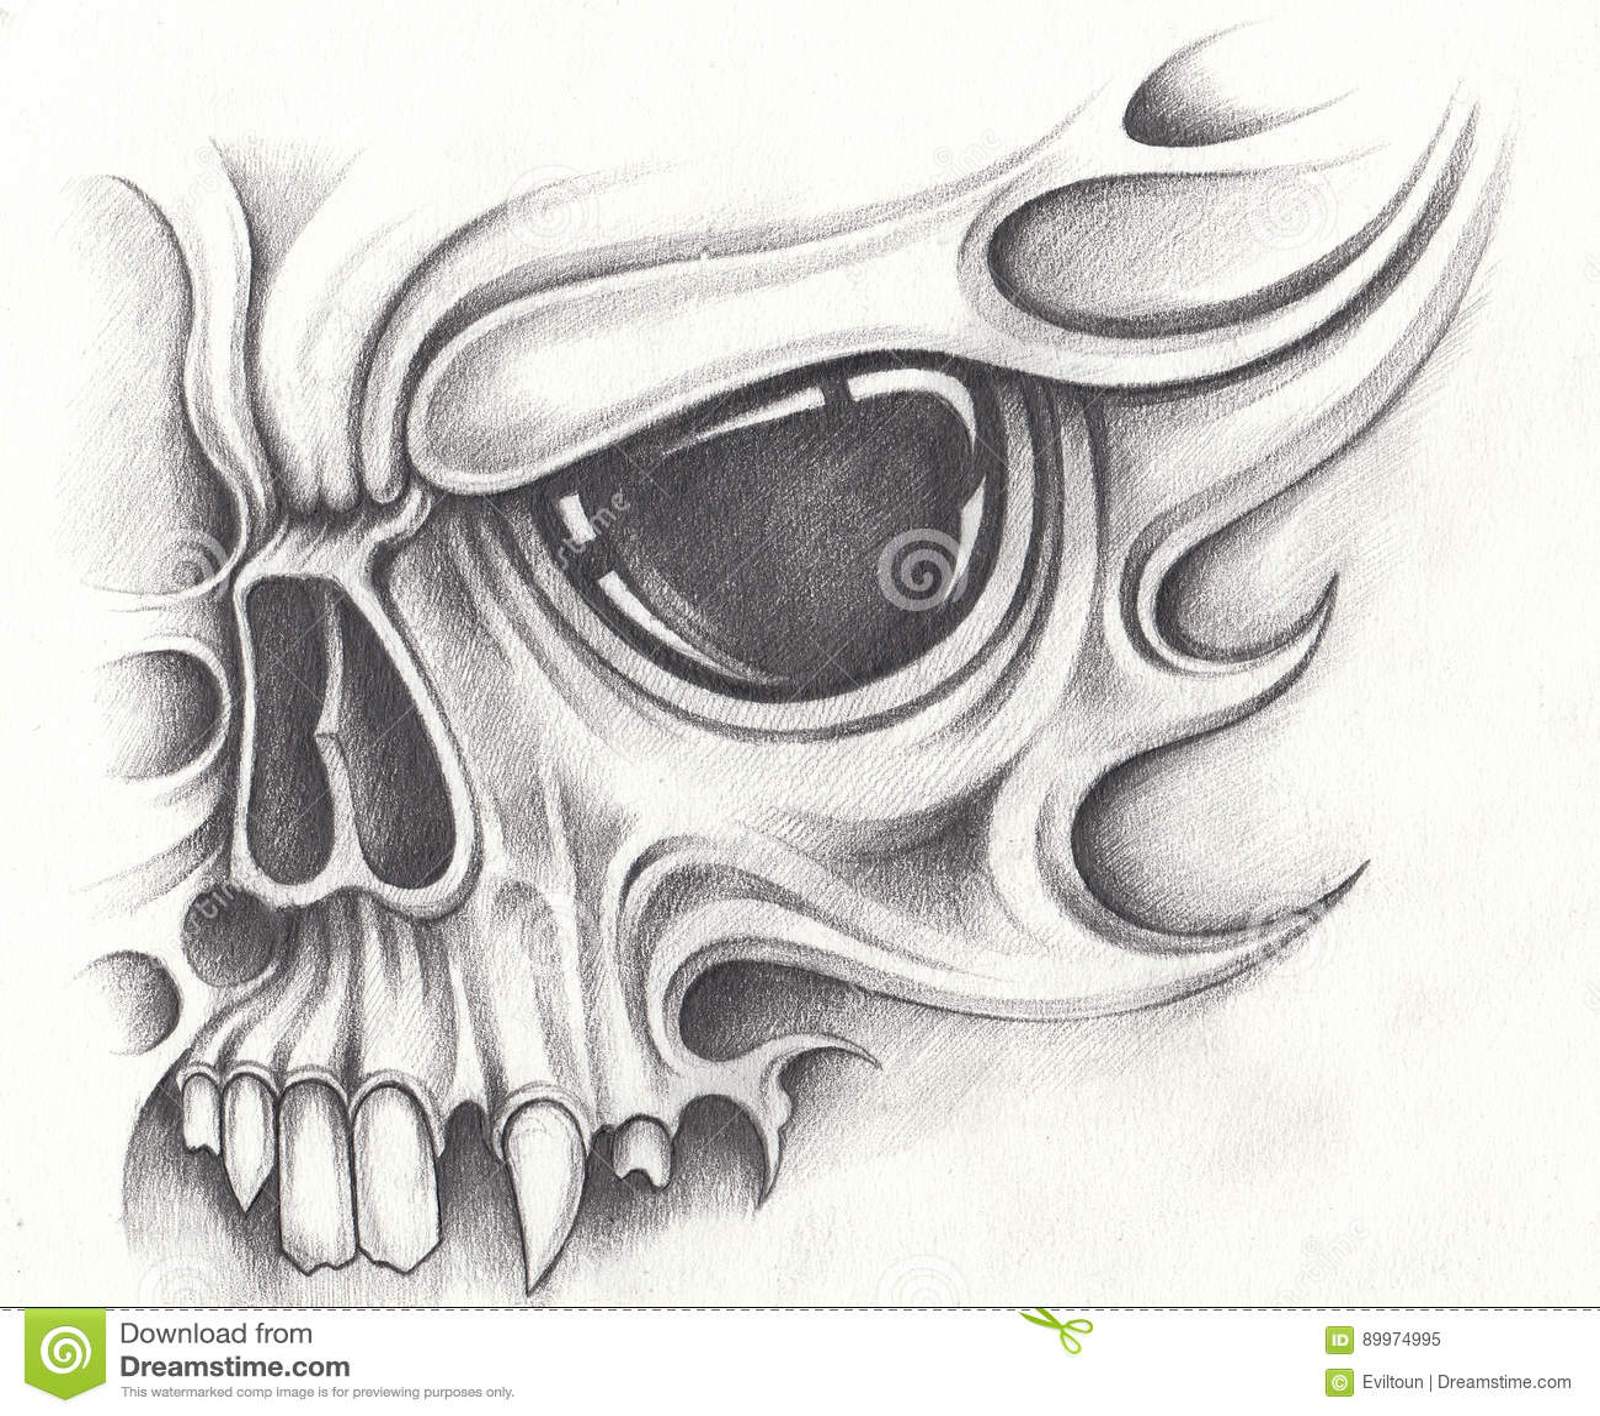 Art design skull tattoo pencil drawing on paper